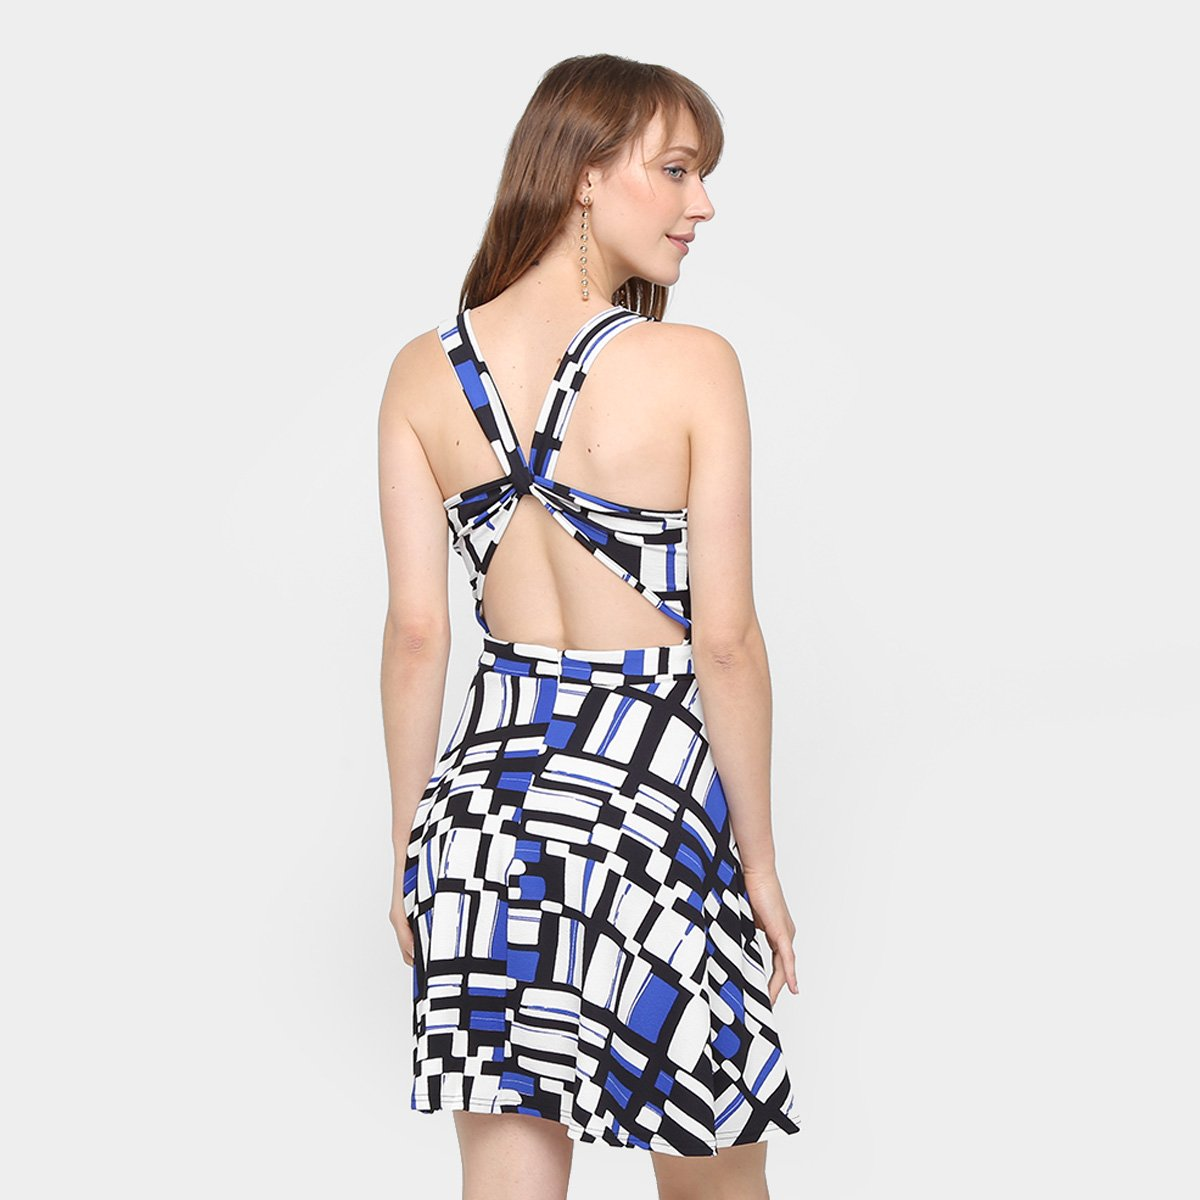 5d4477c70 ... Foto 2 - Vestido Top Moda Evasê Curto Estampado Feminino